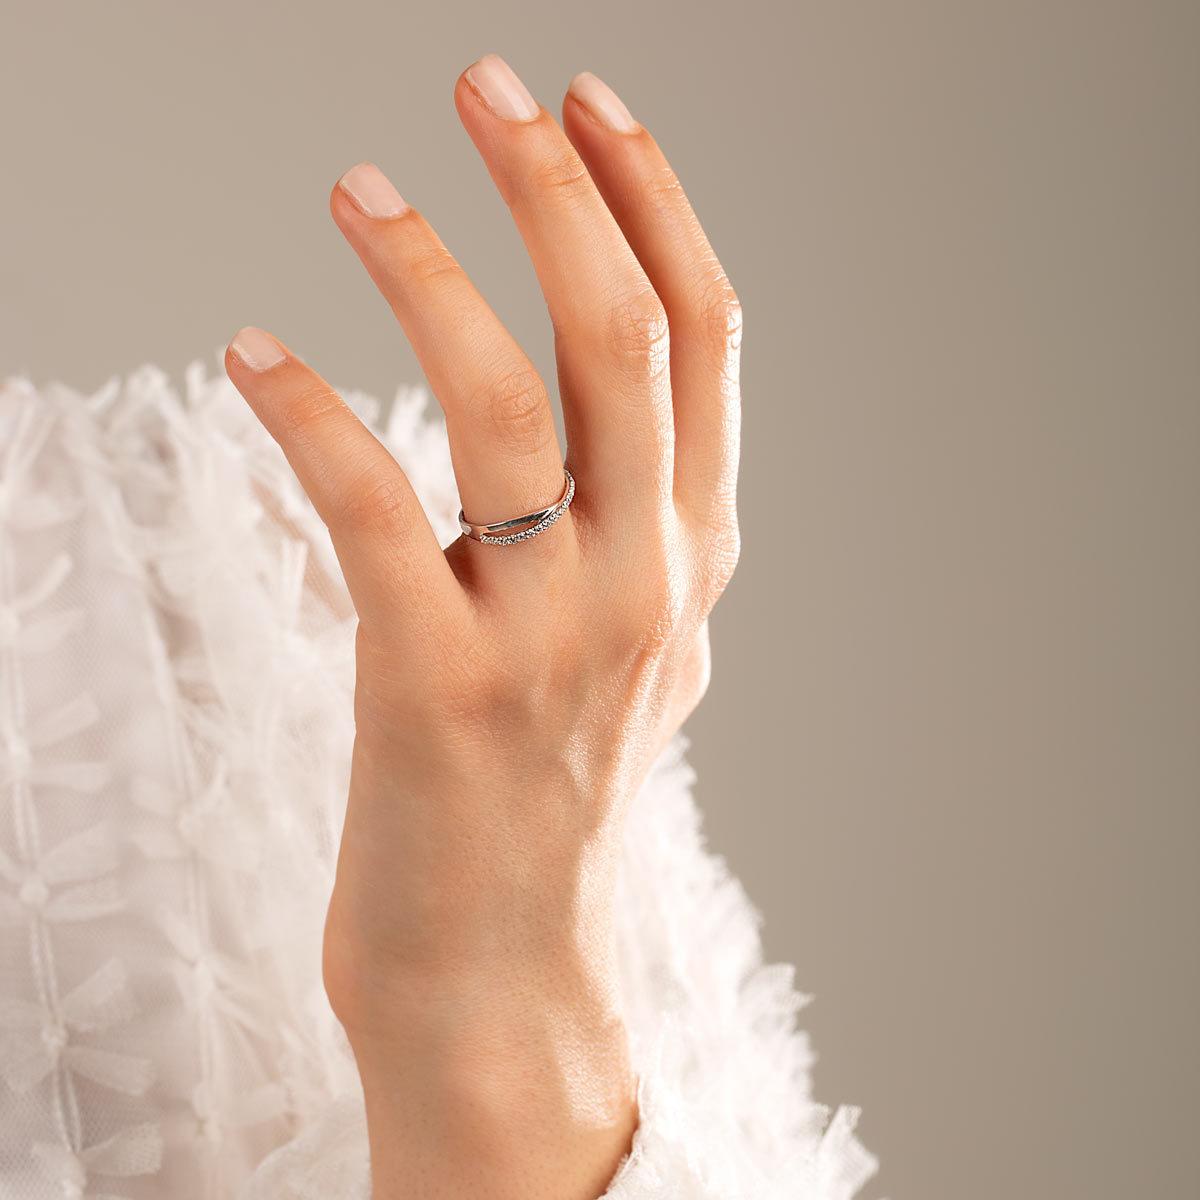 انگشتر طلا سفید ضربدر نگین برلیان